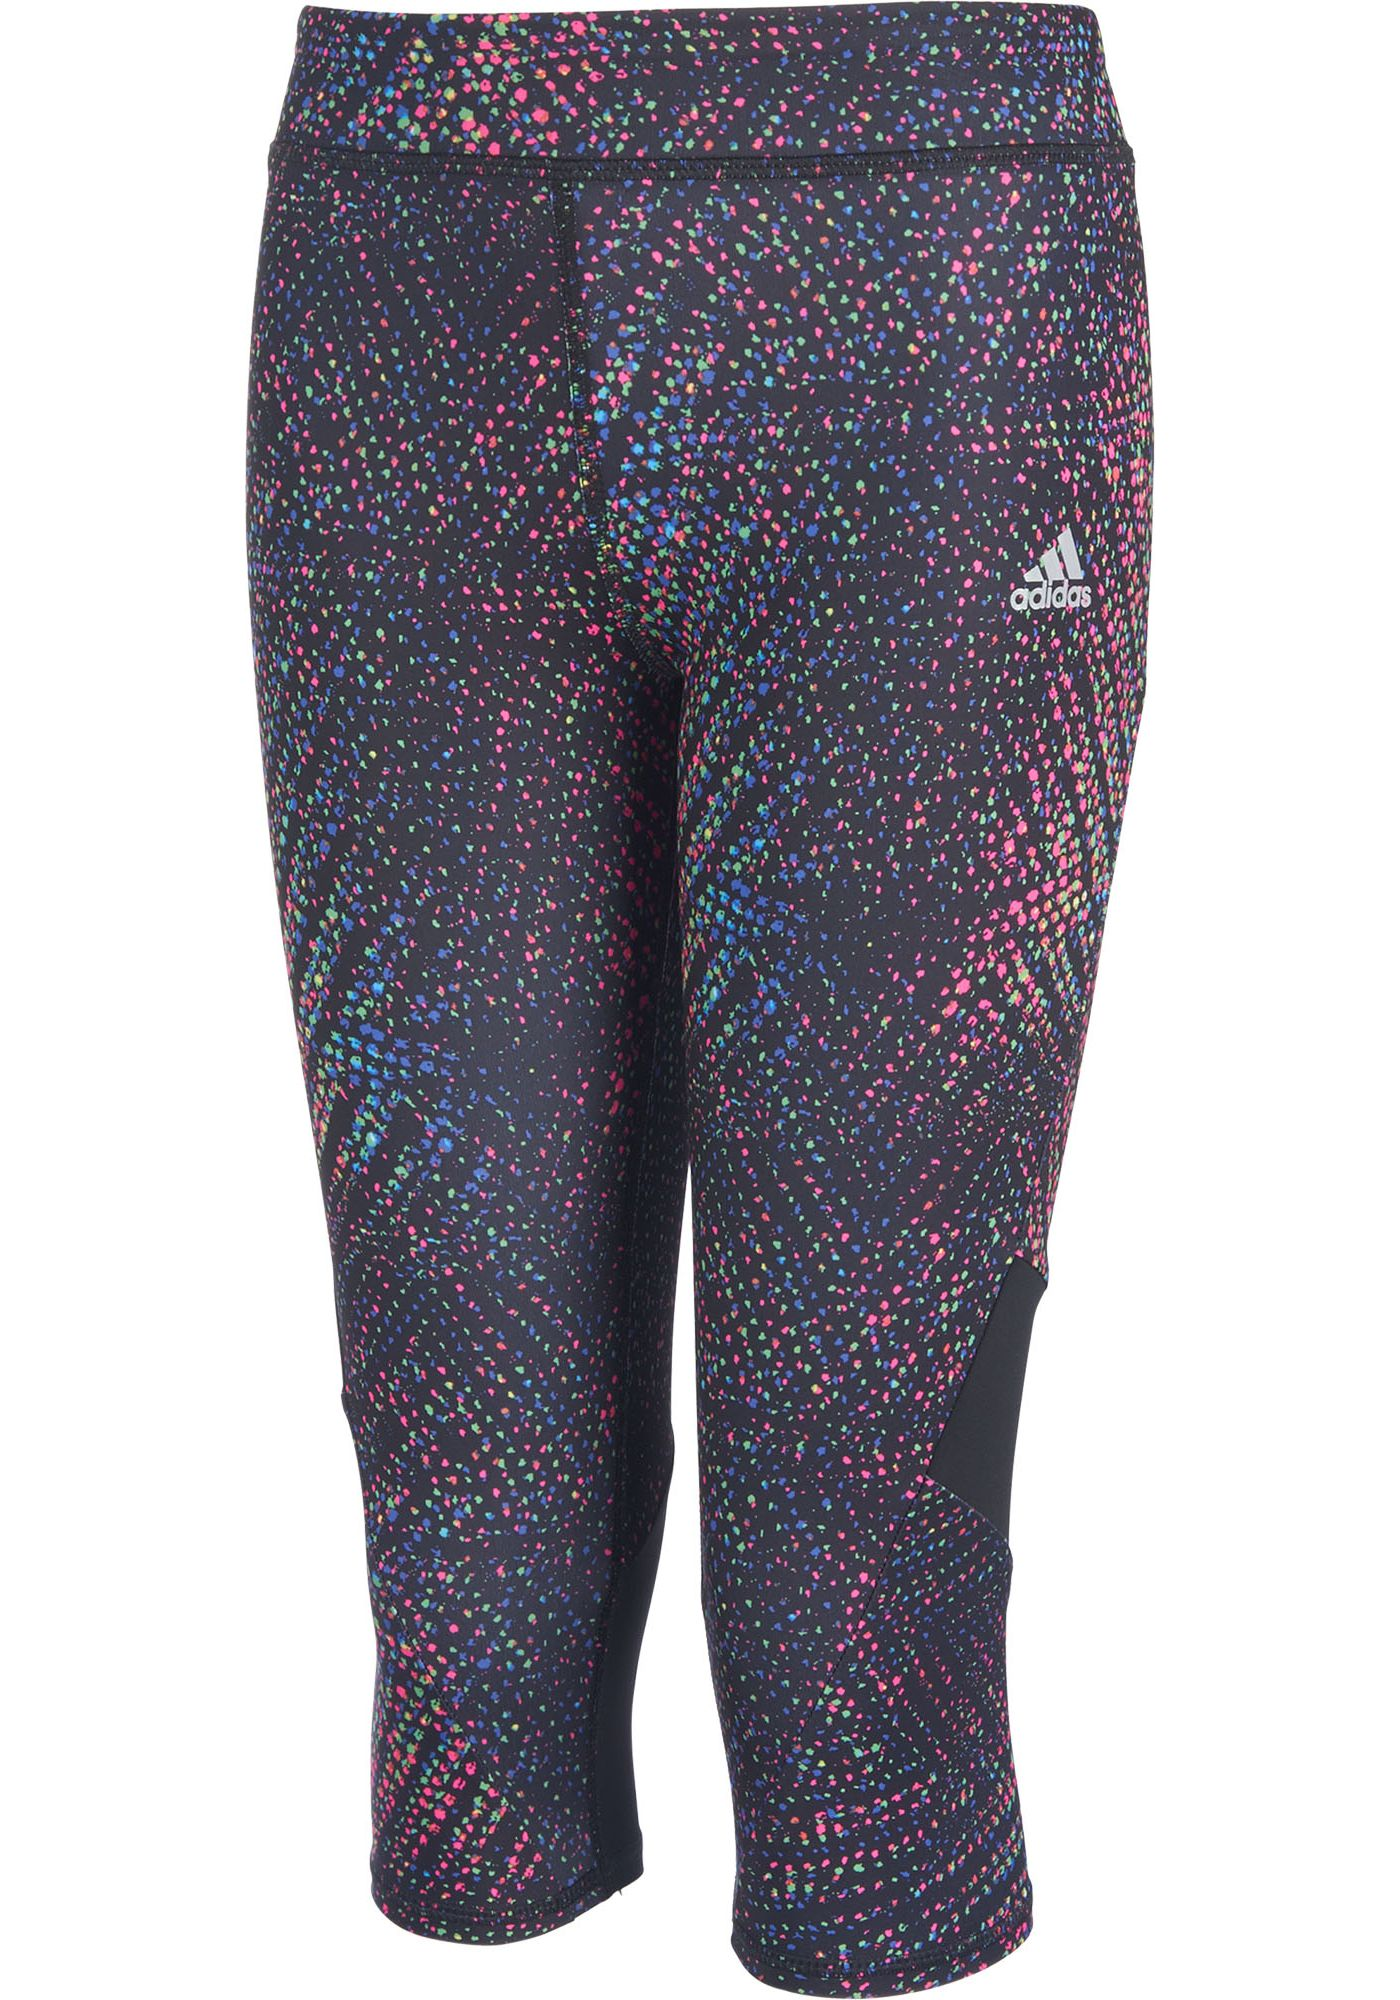 adidas Girls' Alpha Printed Tight Fit Capris